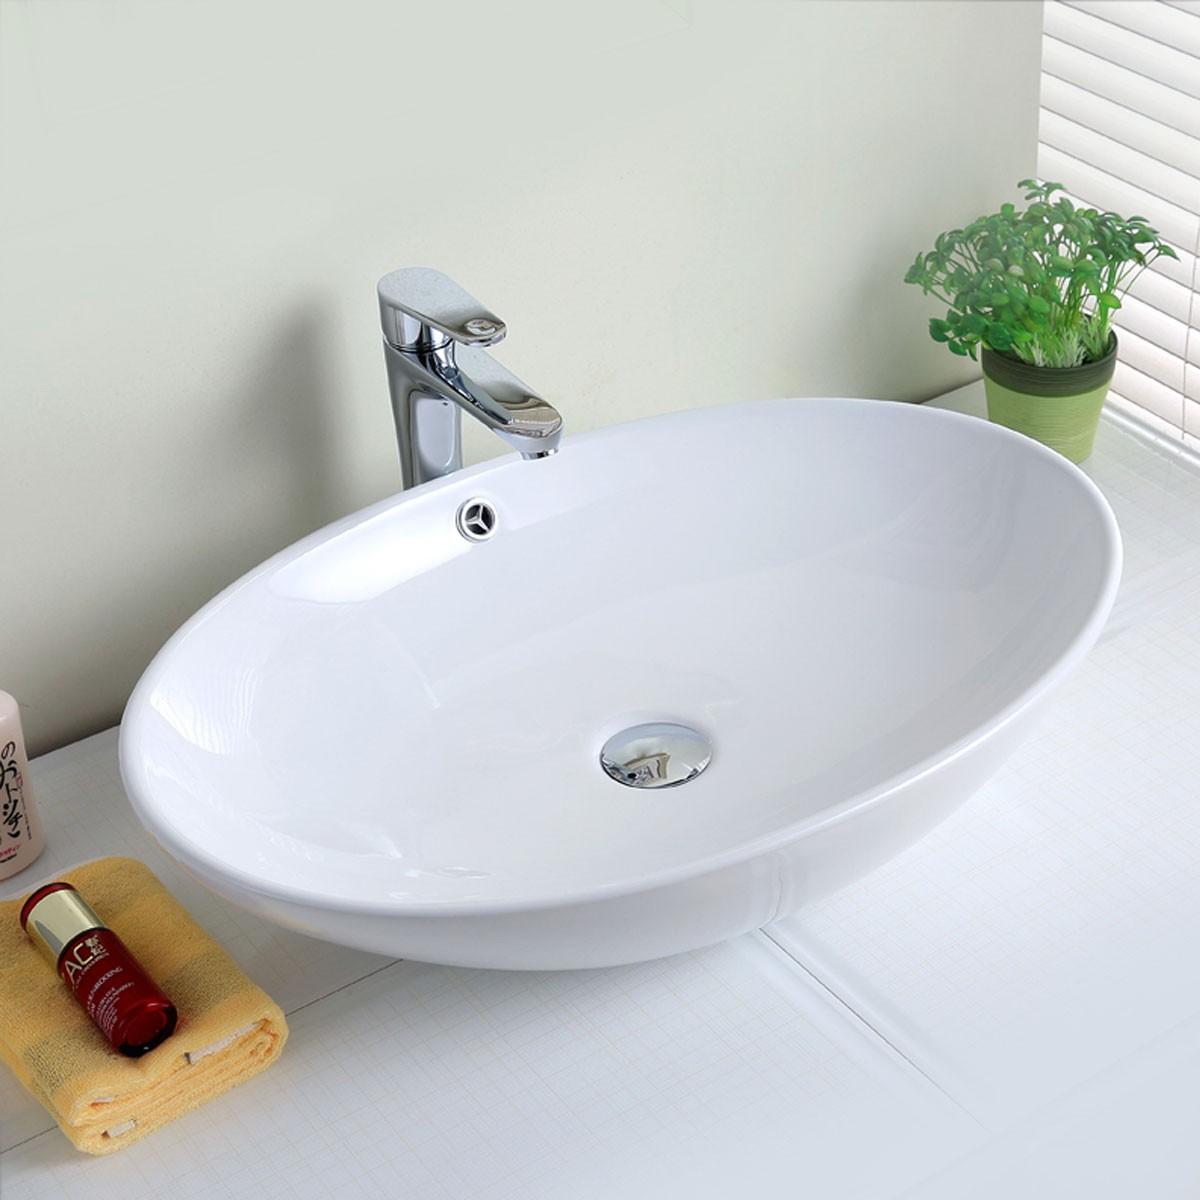 Decoraport White Oval Ceramic Above Counter Basin Vessel Vanity Sink (CL-1164)